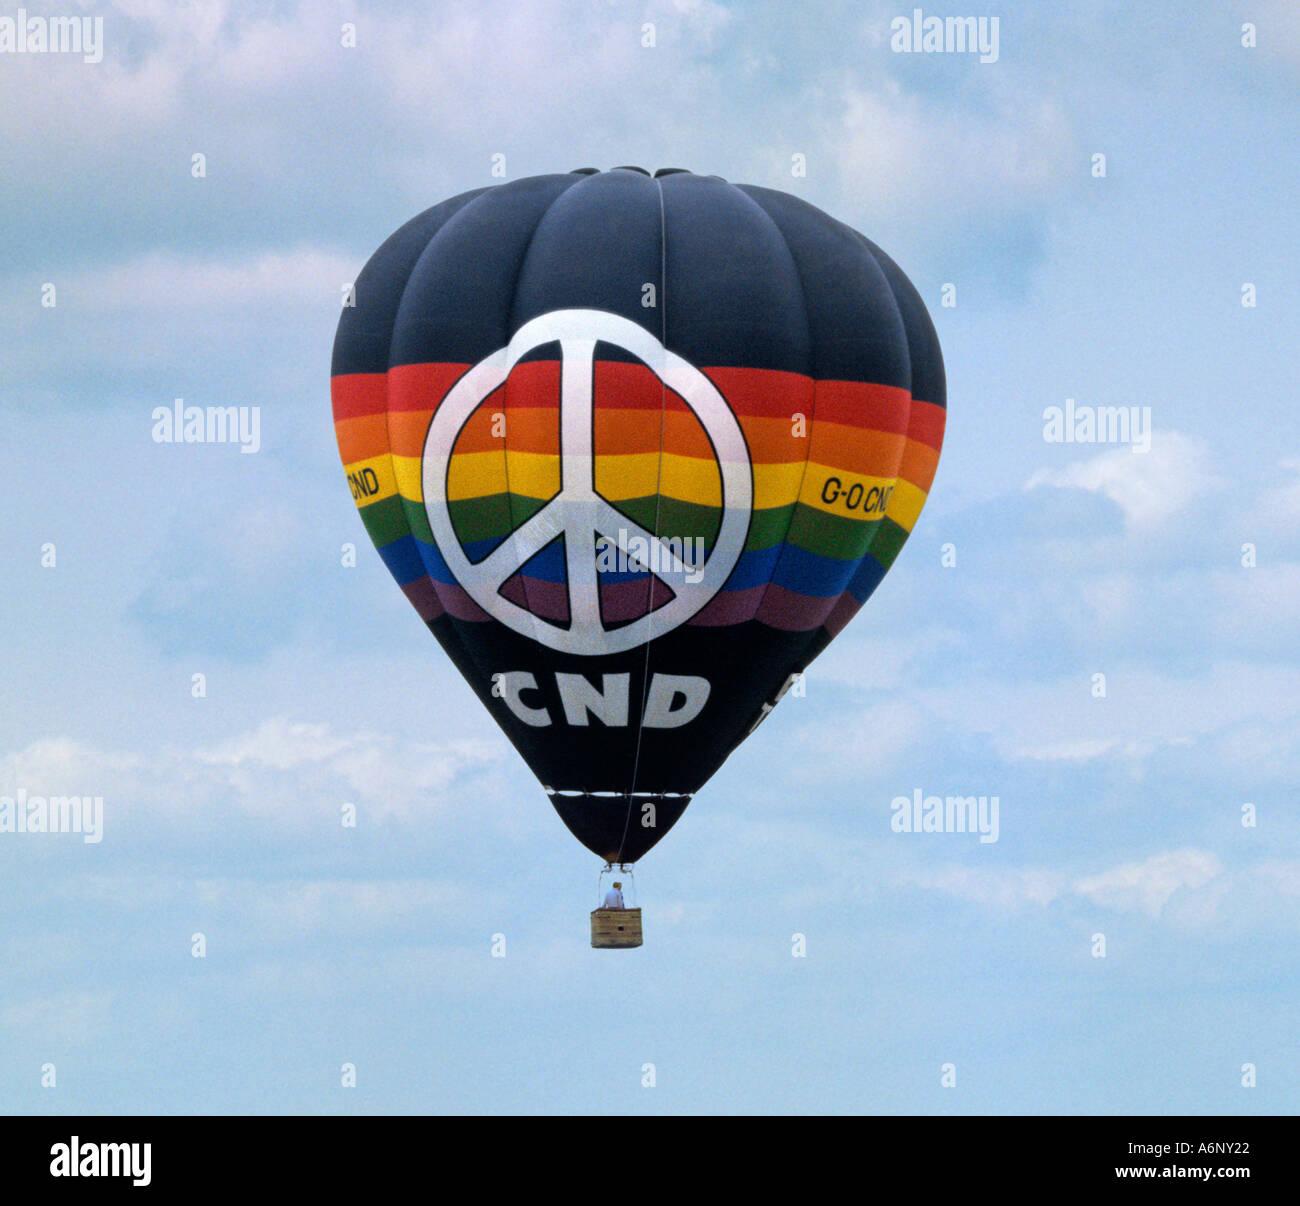 CND palloncino a CND rally Immagini Stock